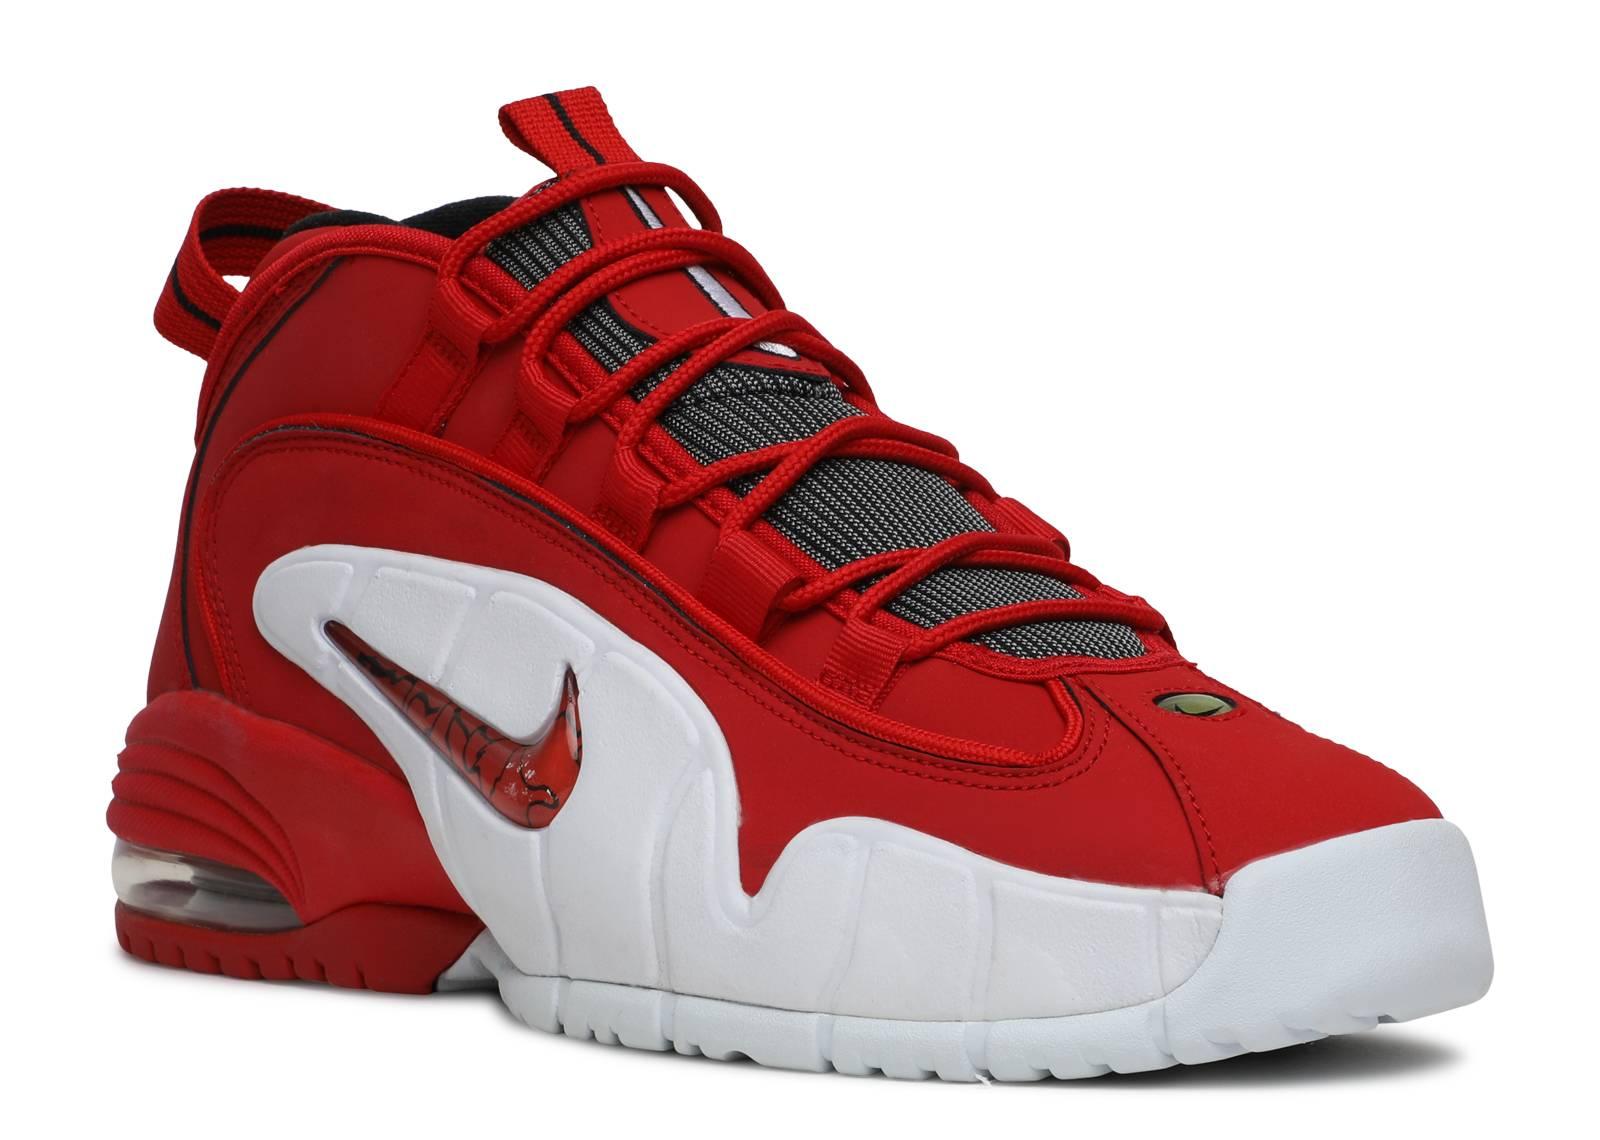 d3ecfdfaf0529 ... red roshe run 33c09 1bbe1  italy air max penny rival 8cdb6 f2c47